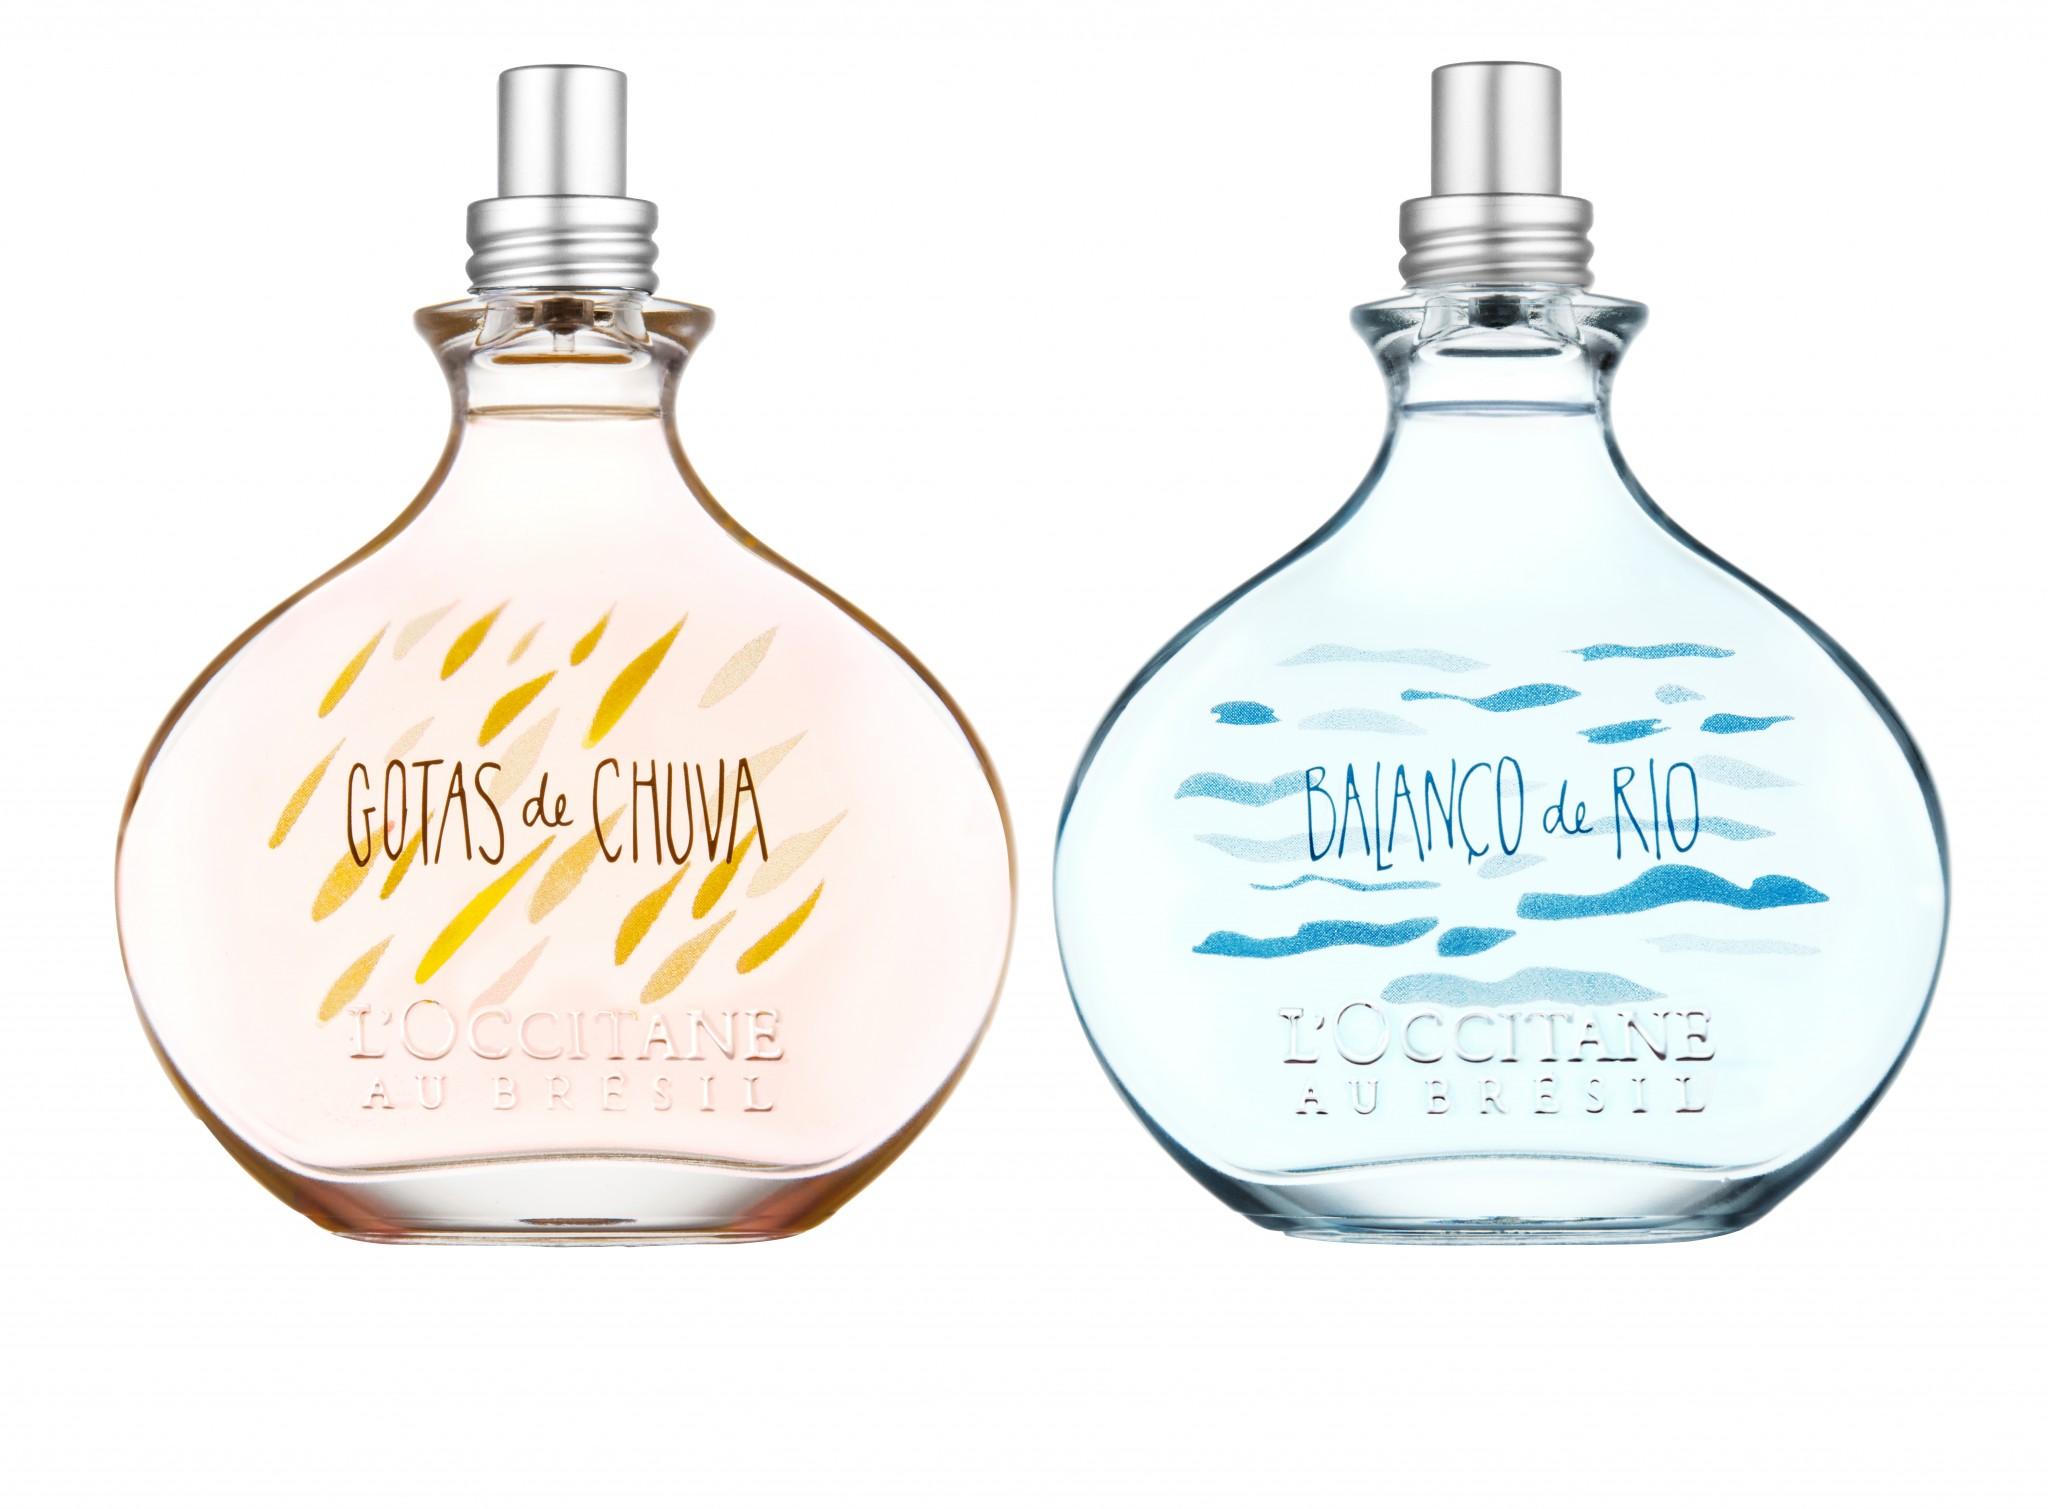 frascos-reflexo-aguas-do-brasil-loccitane-au-bresil-2